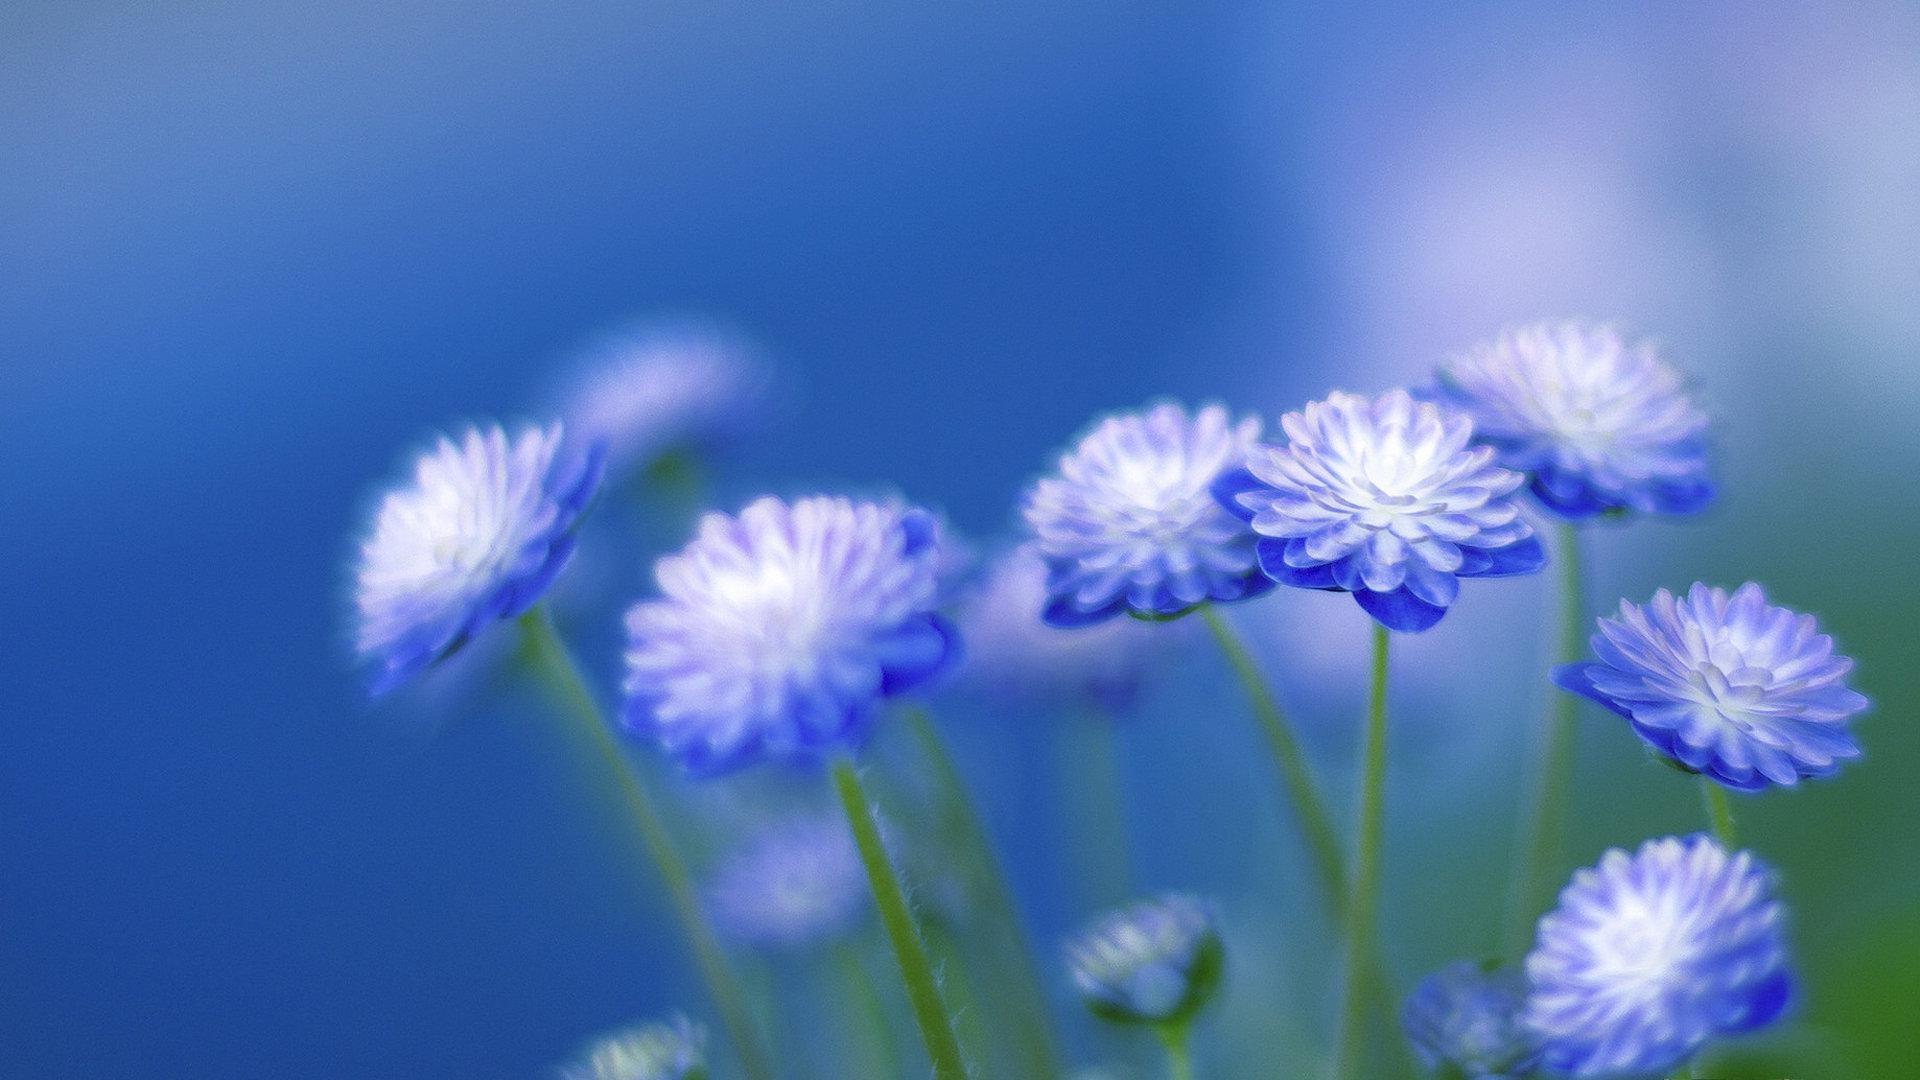 blue flower wallpaper (61+ images)